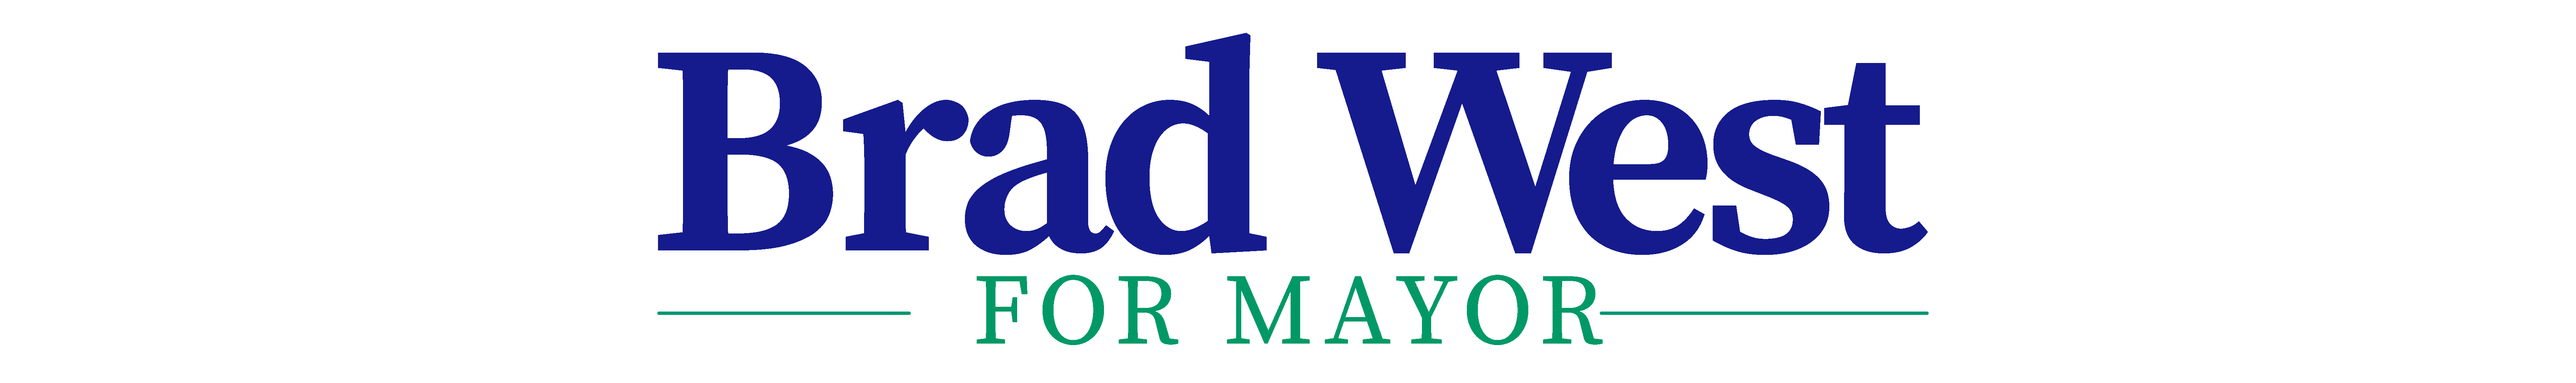 Brad West for Mayor